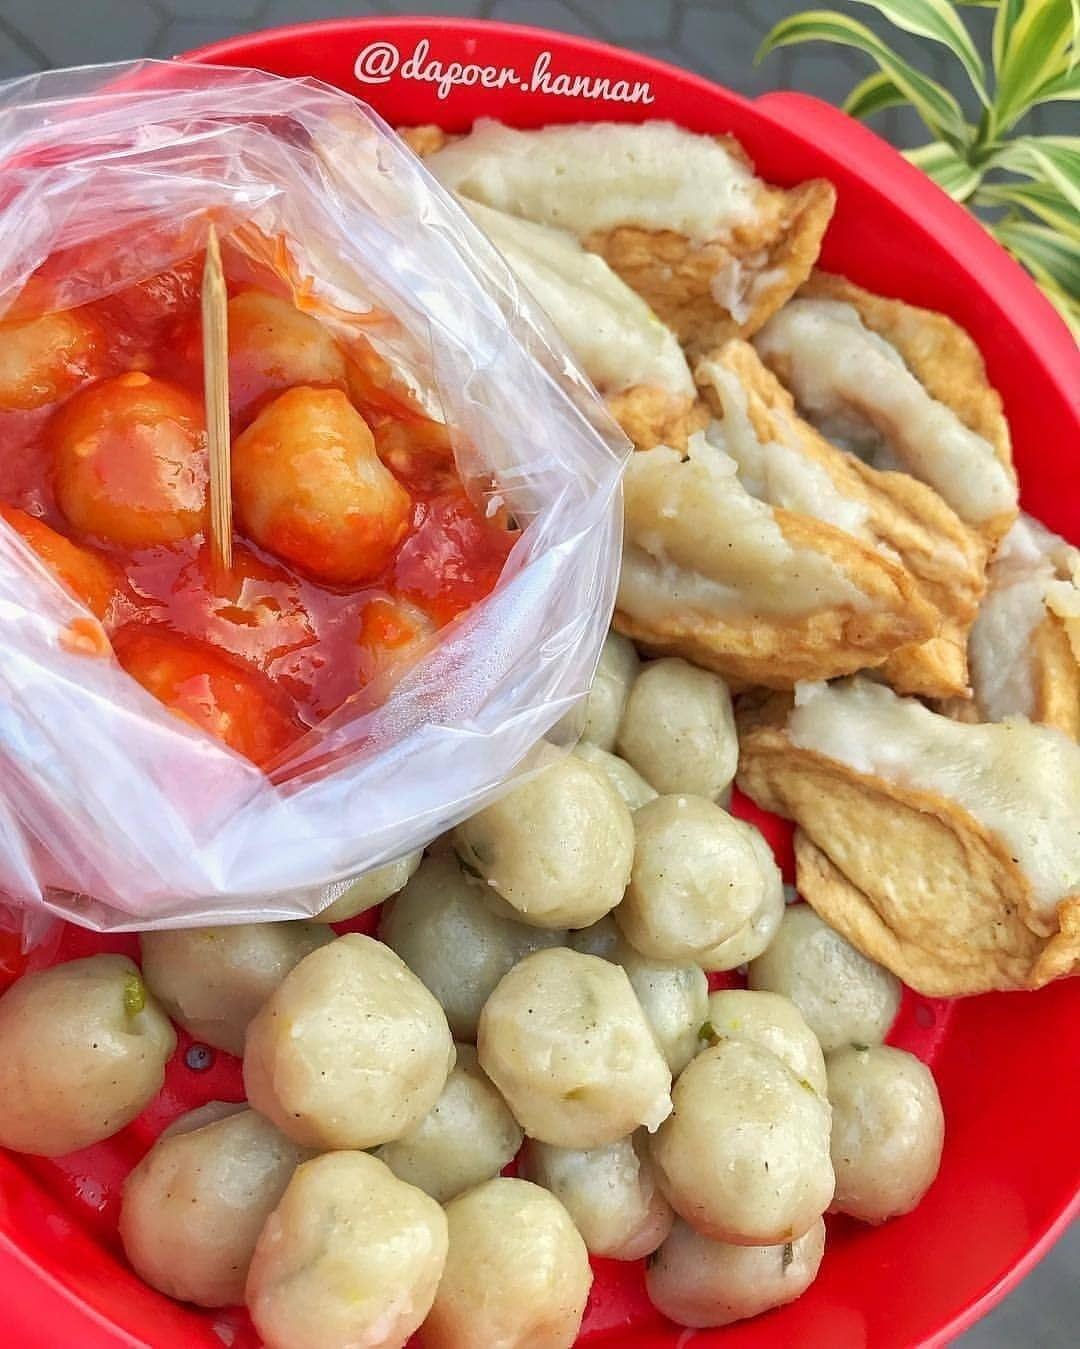 Bakso Kojek Cilok Tahu Aci Saos Pedas By Dapoer Hannan Resep Masakan Resep Resep Masakan Indonesia